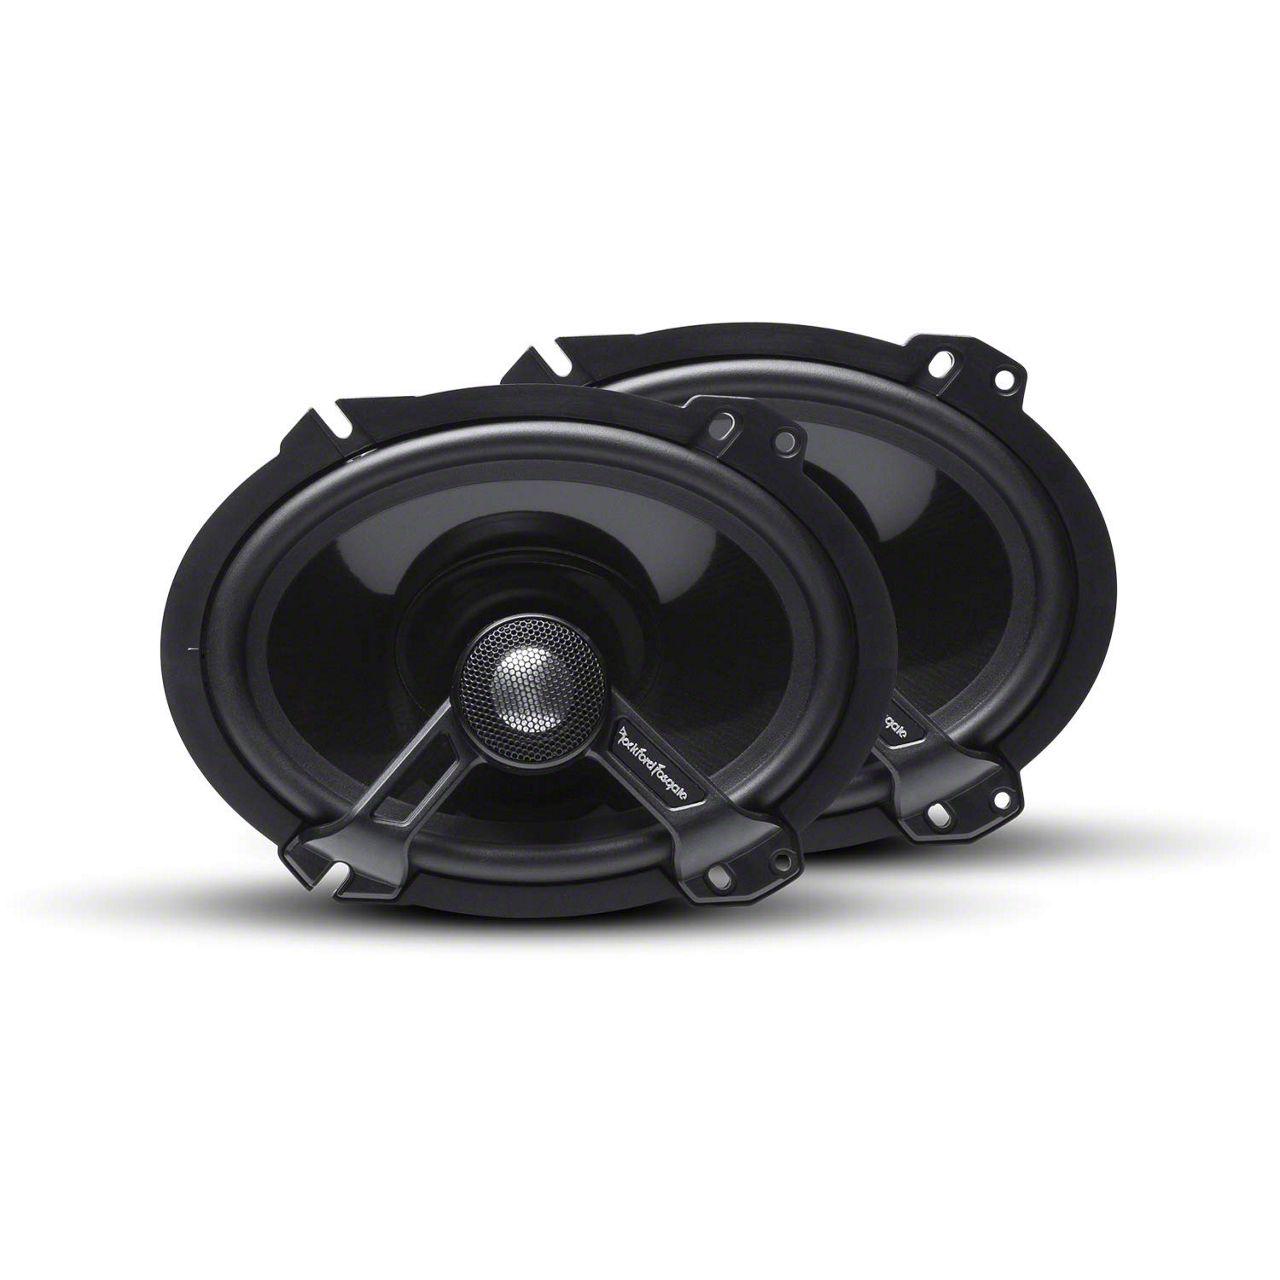 Rockford Fosgate Sony 7 Speaker System Upgrade (09-14 F-150 SuperCab, SuperCrew)